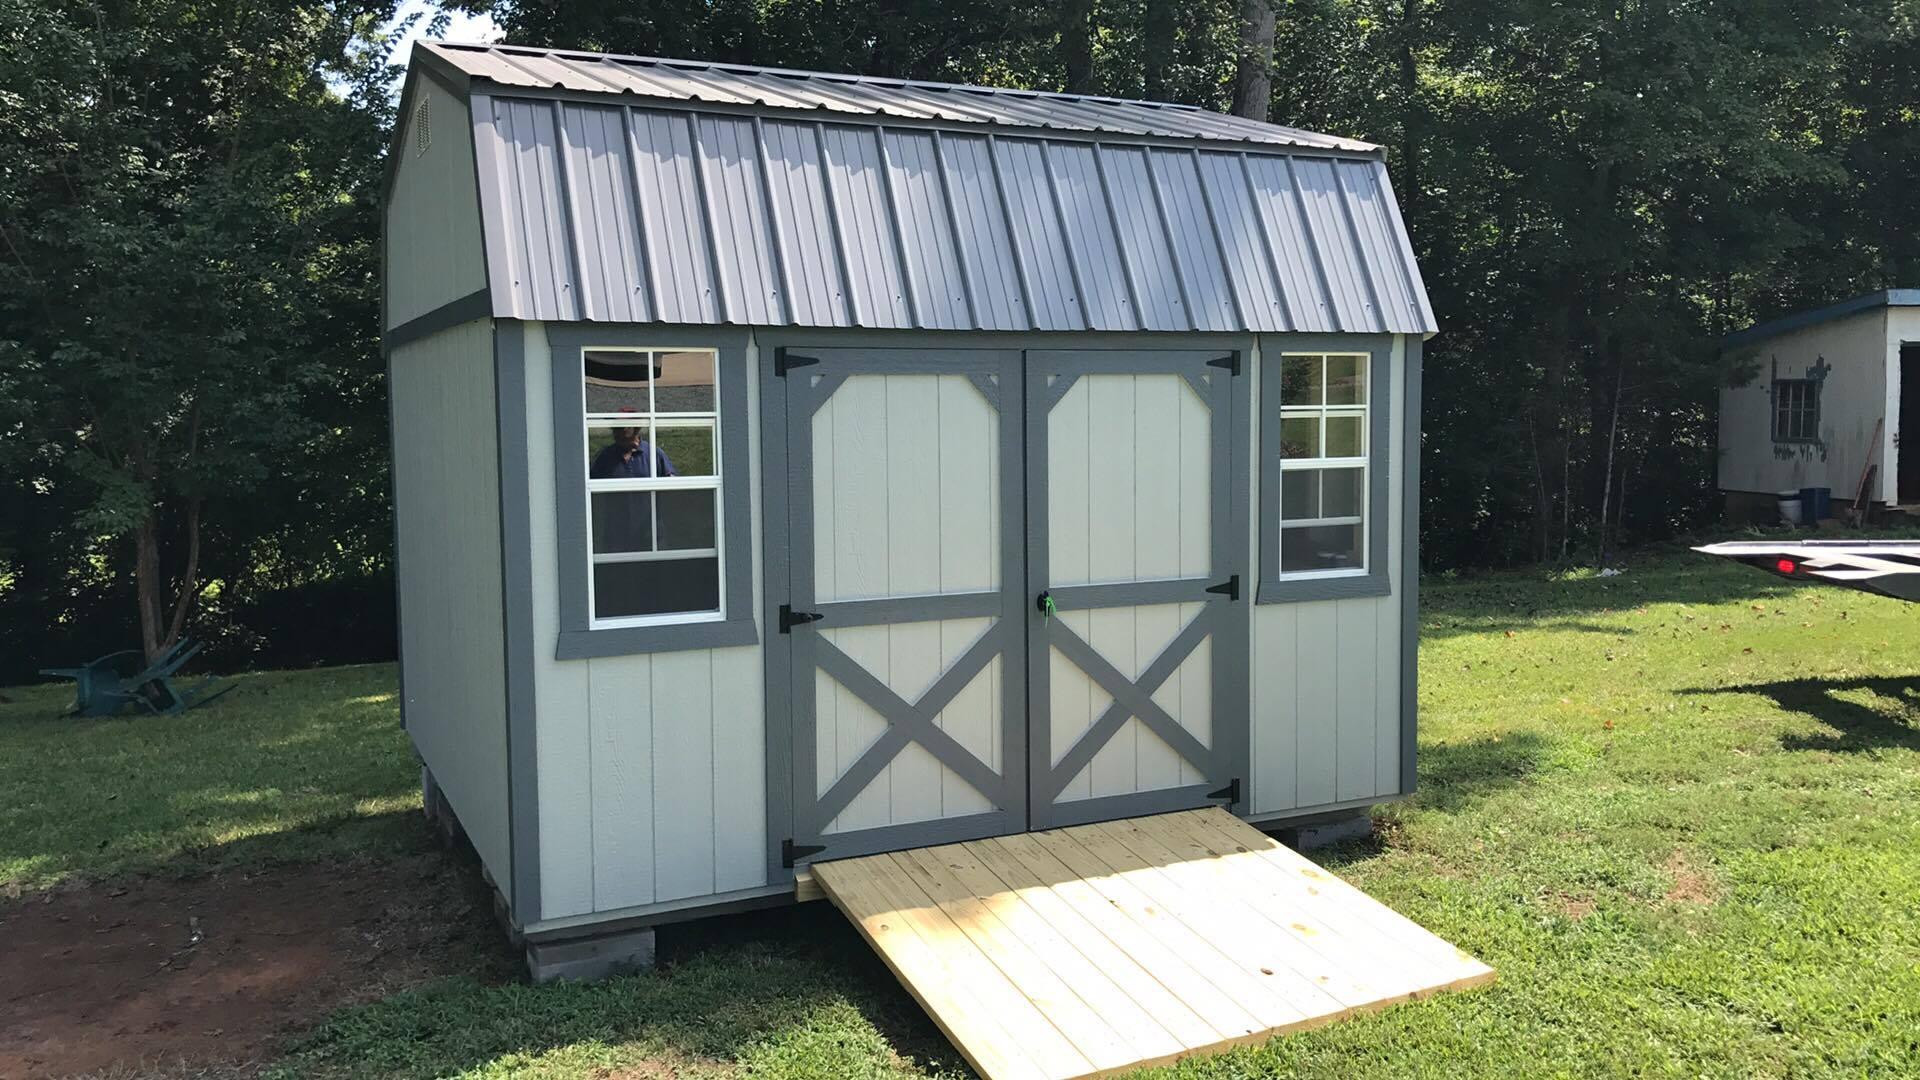 221-painted-lofted-barn.jpg